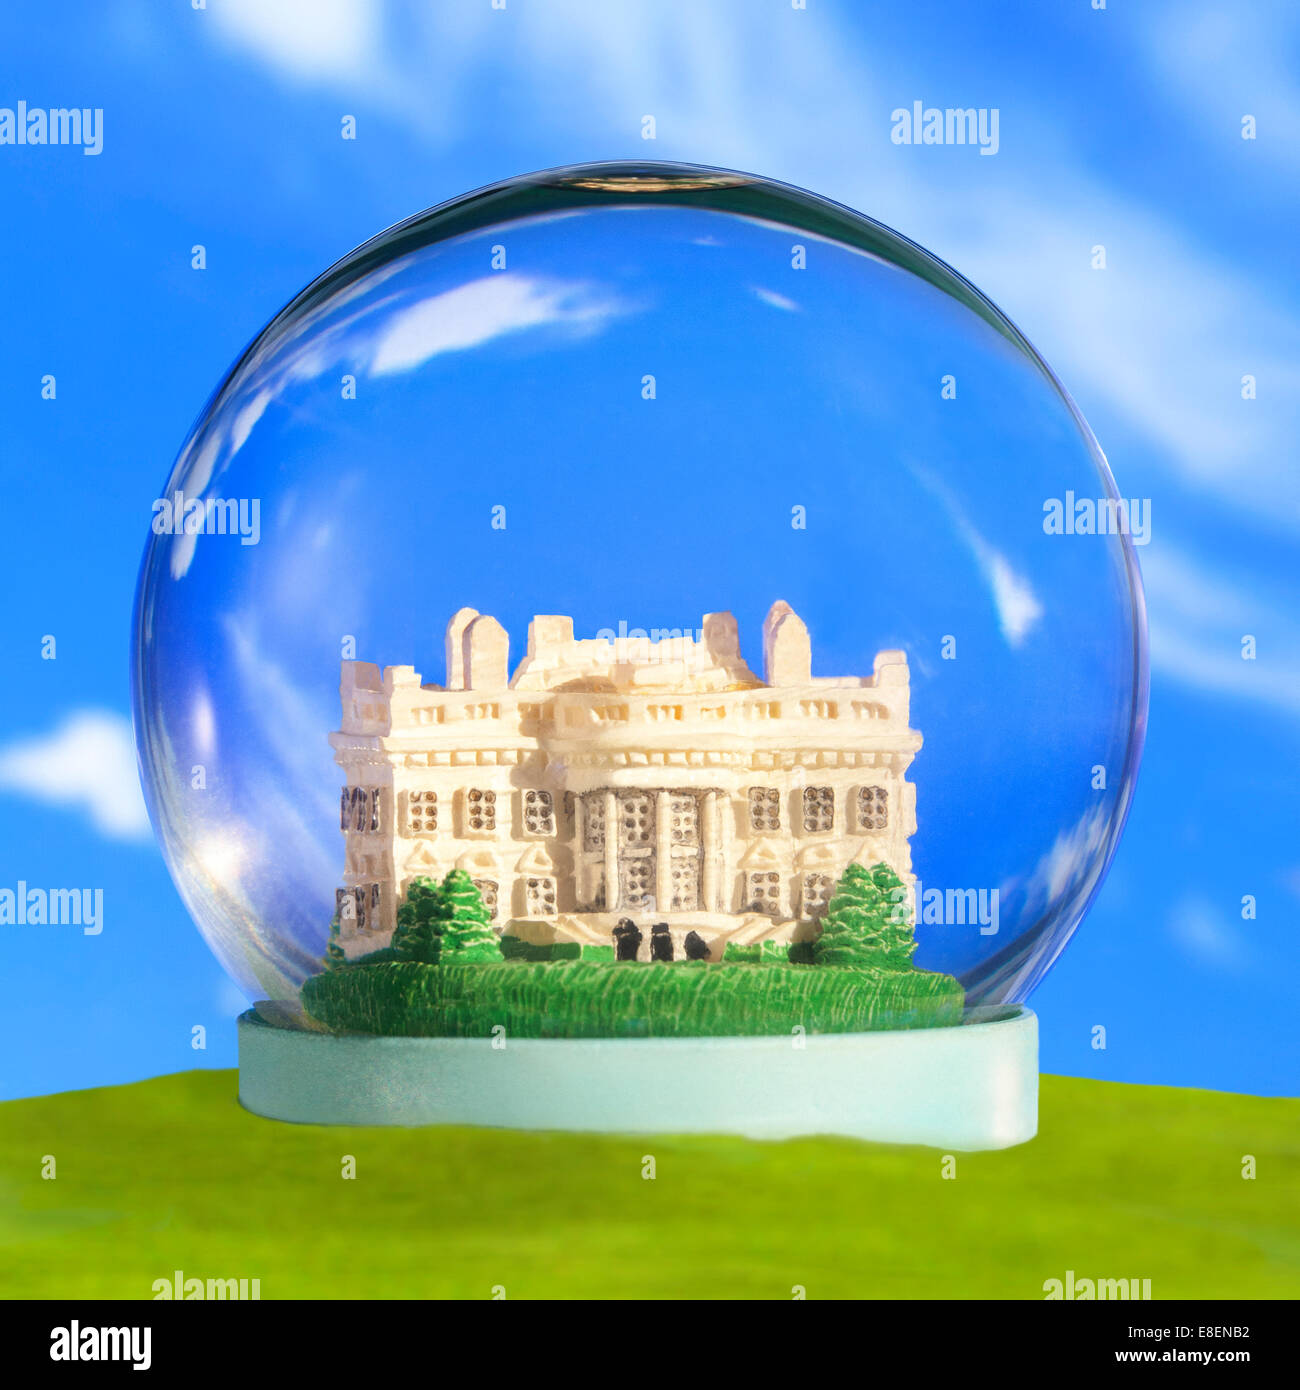 Un globo de nieve Snow Dome burbuja de cristal con la Casa Blanca en Washington DC. Concepto de aislamiento de protección Imagen De Stock